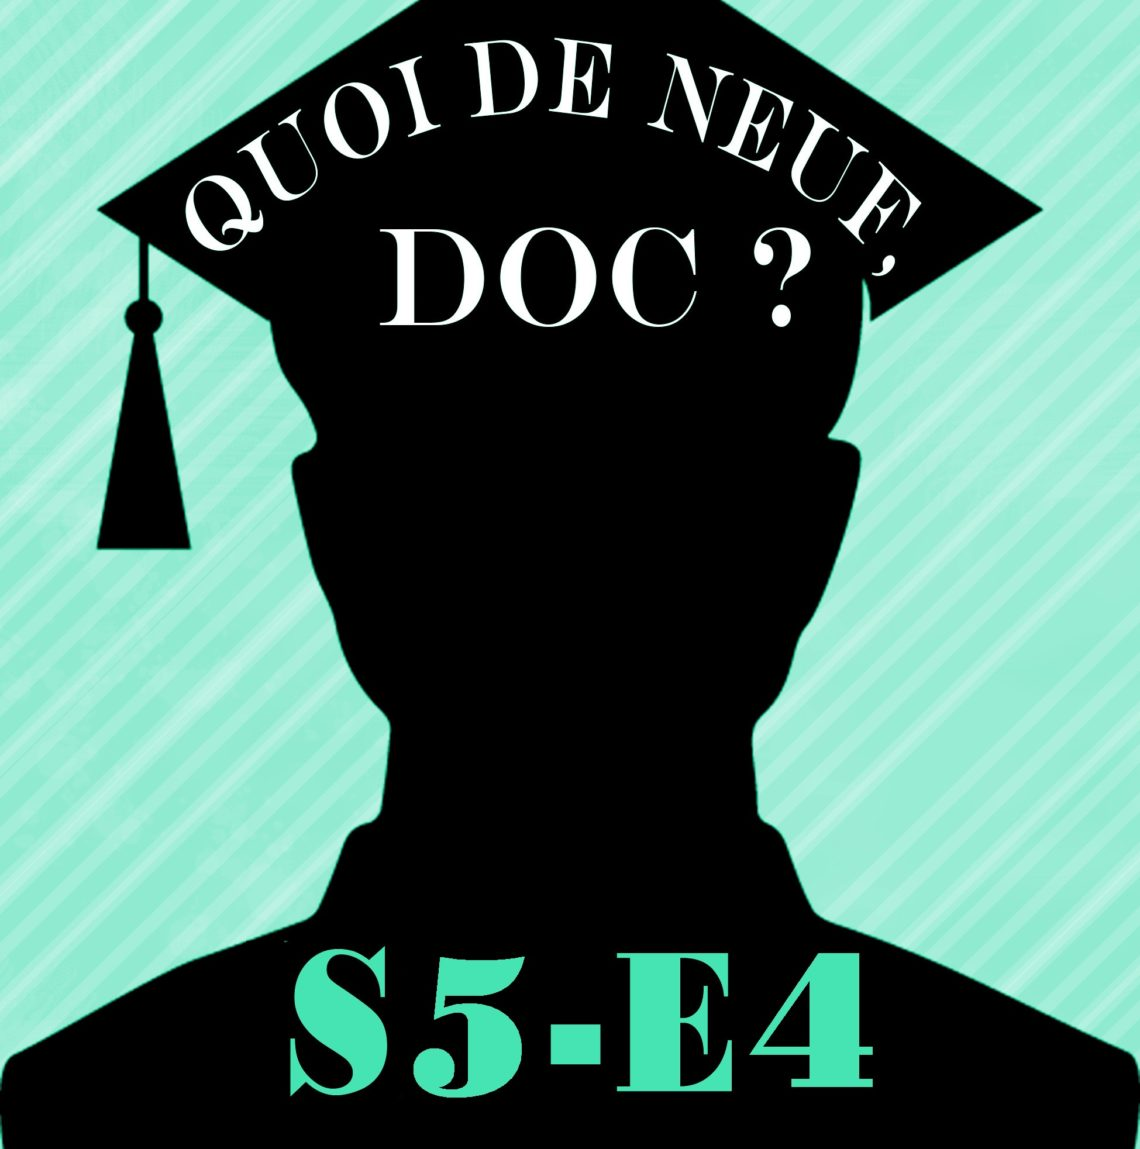 QDND S5E4 du mercredi 9 janvier 2019